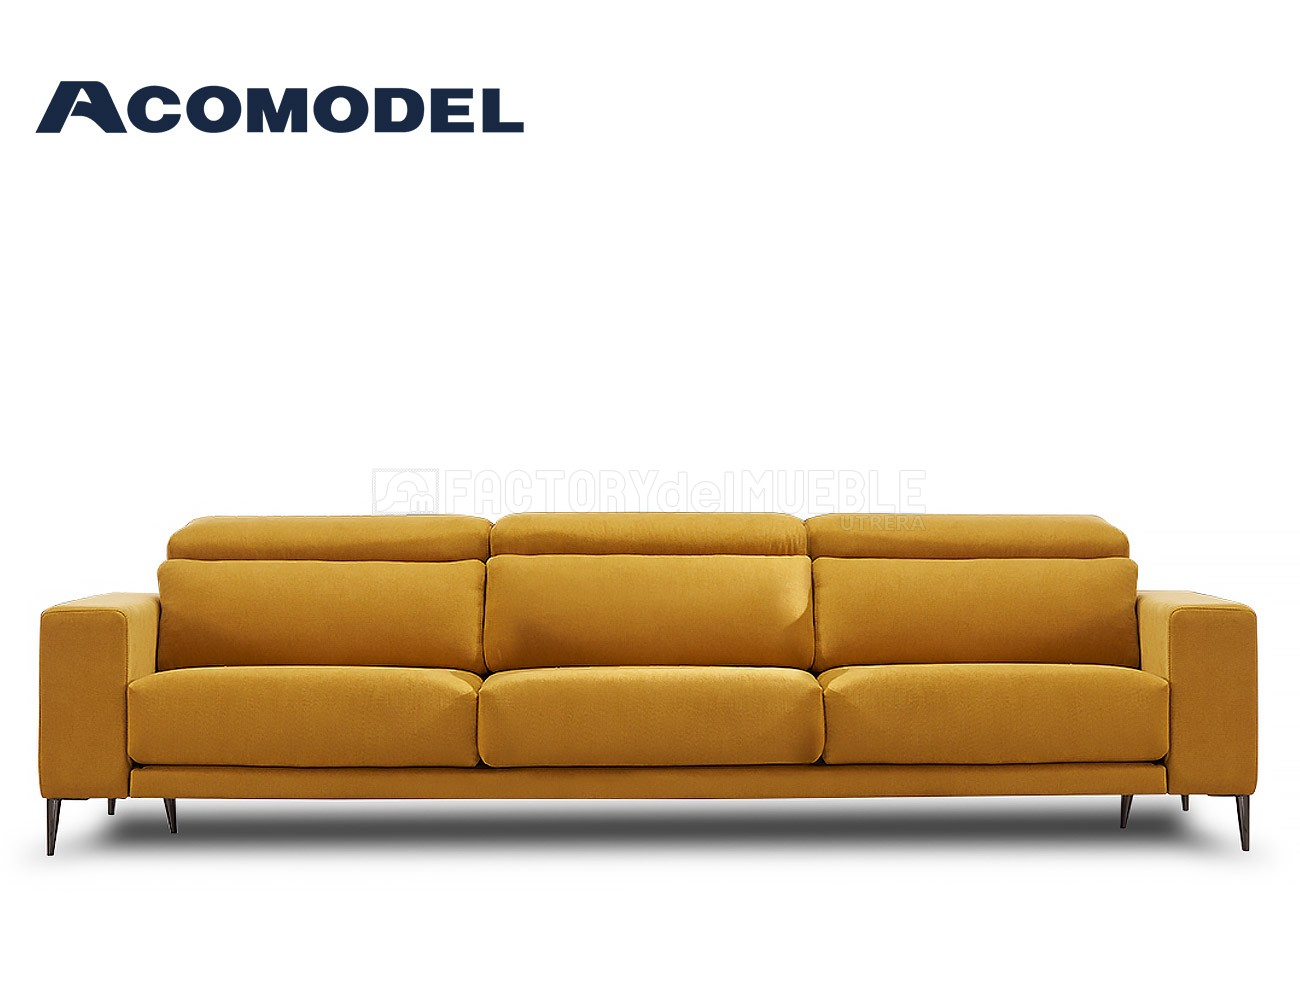 Sofa prisma acomodel